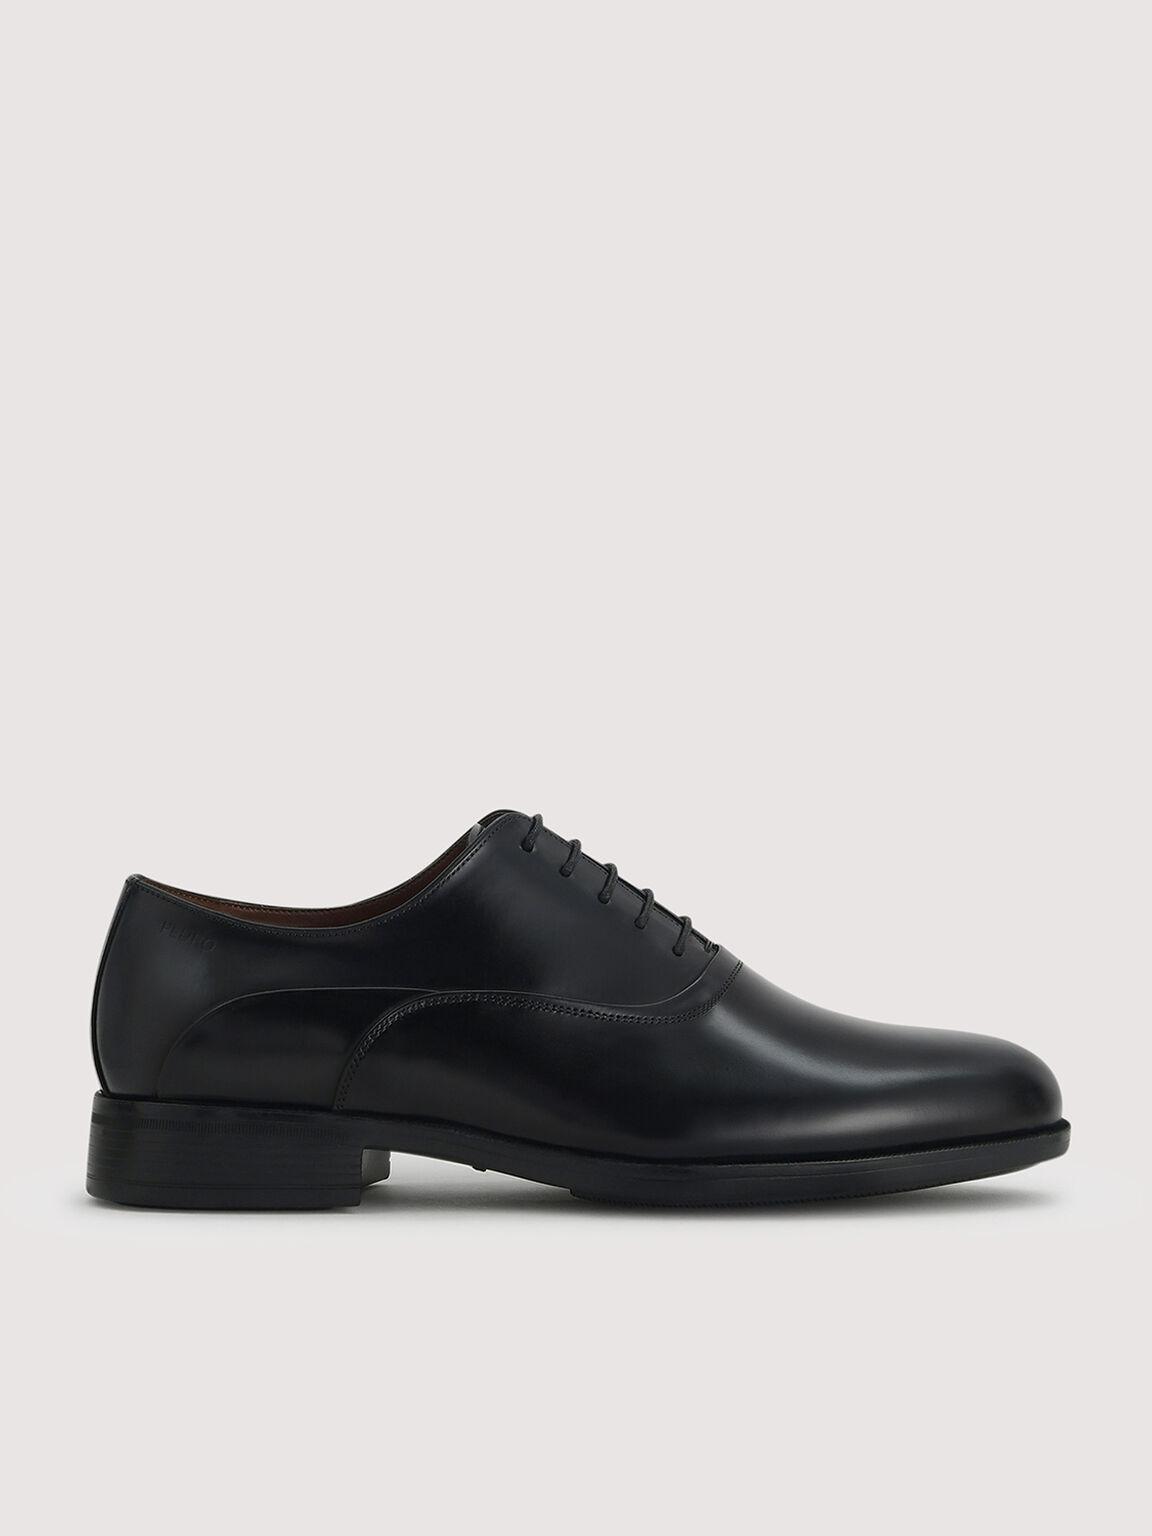 Lightweight Leather Oxford Shoes, Black, hi-res